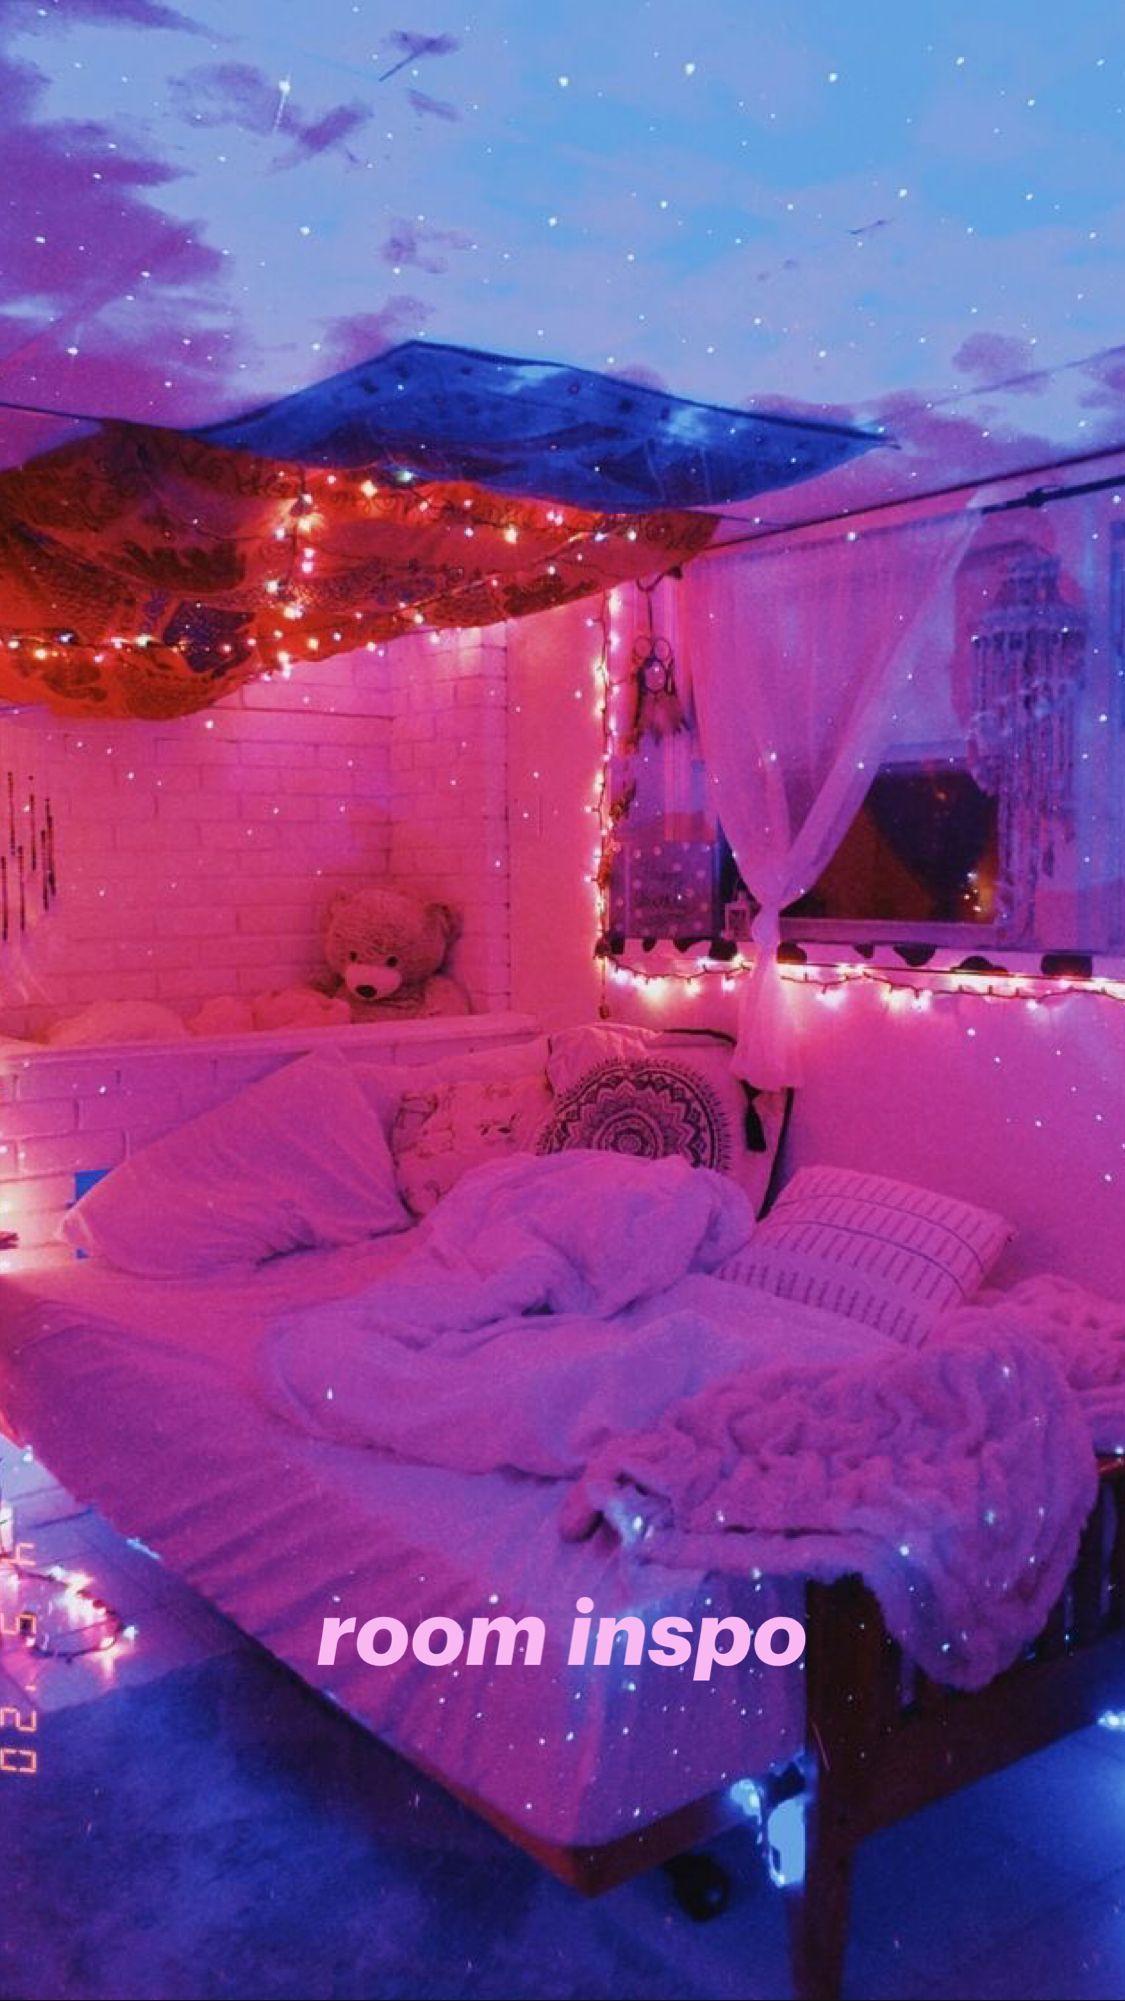 Nice room inspo